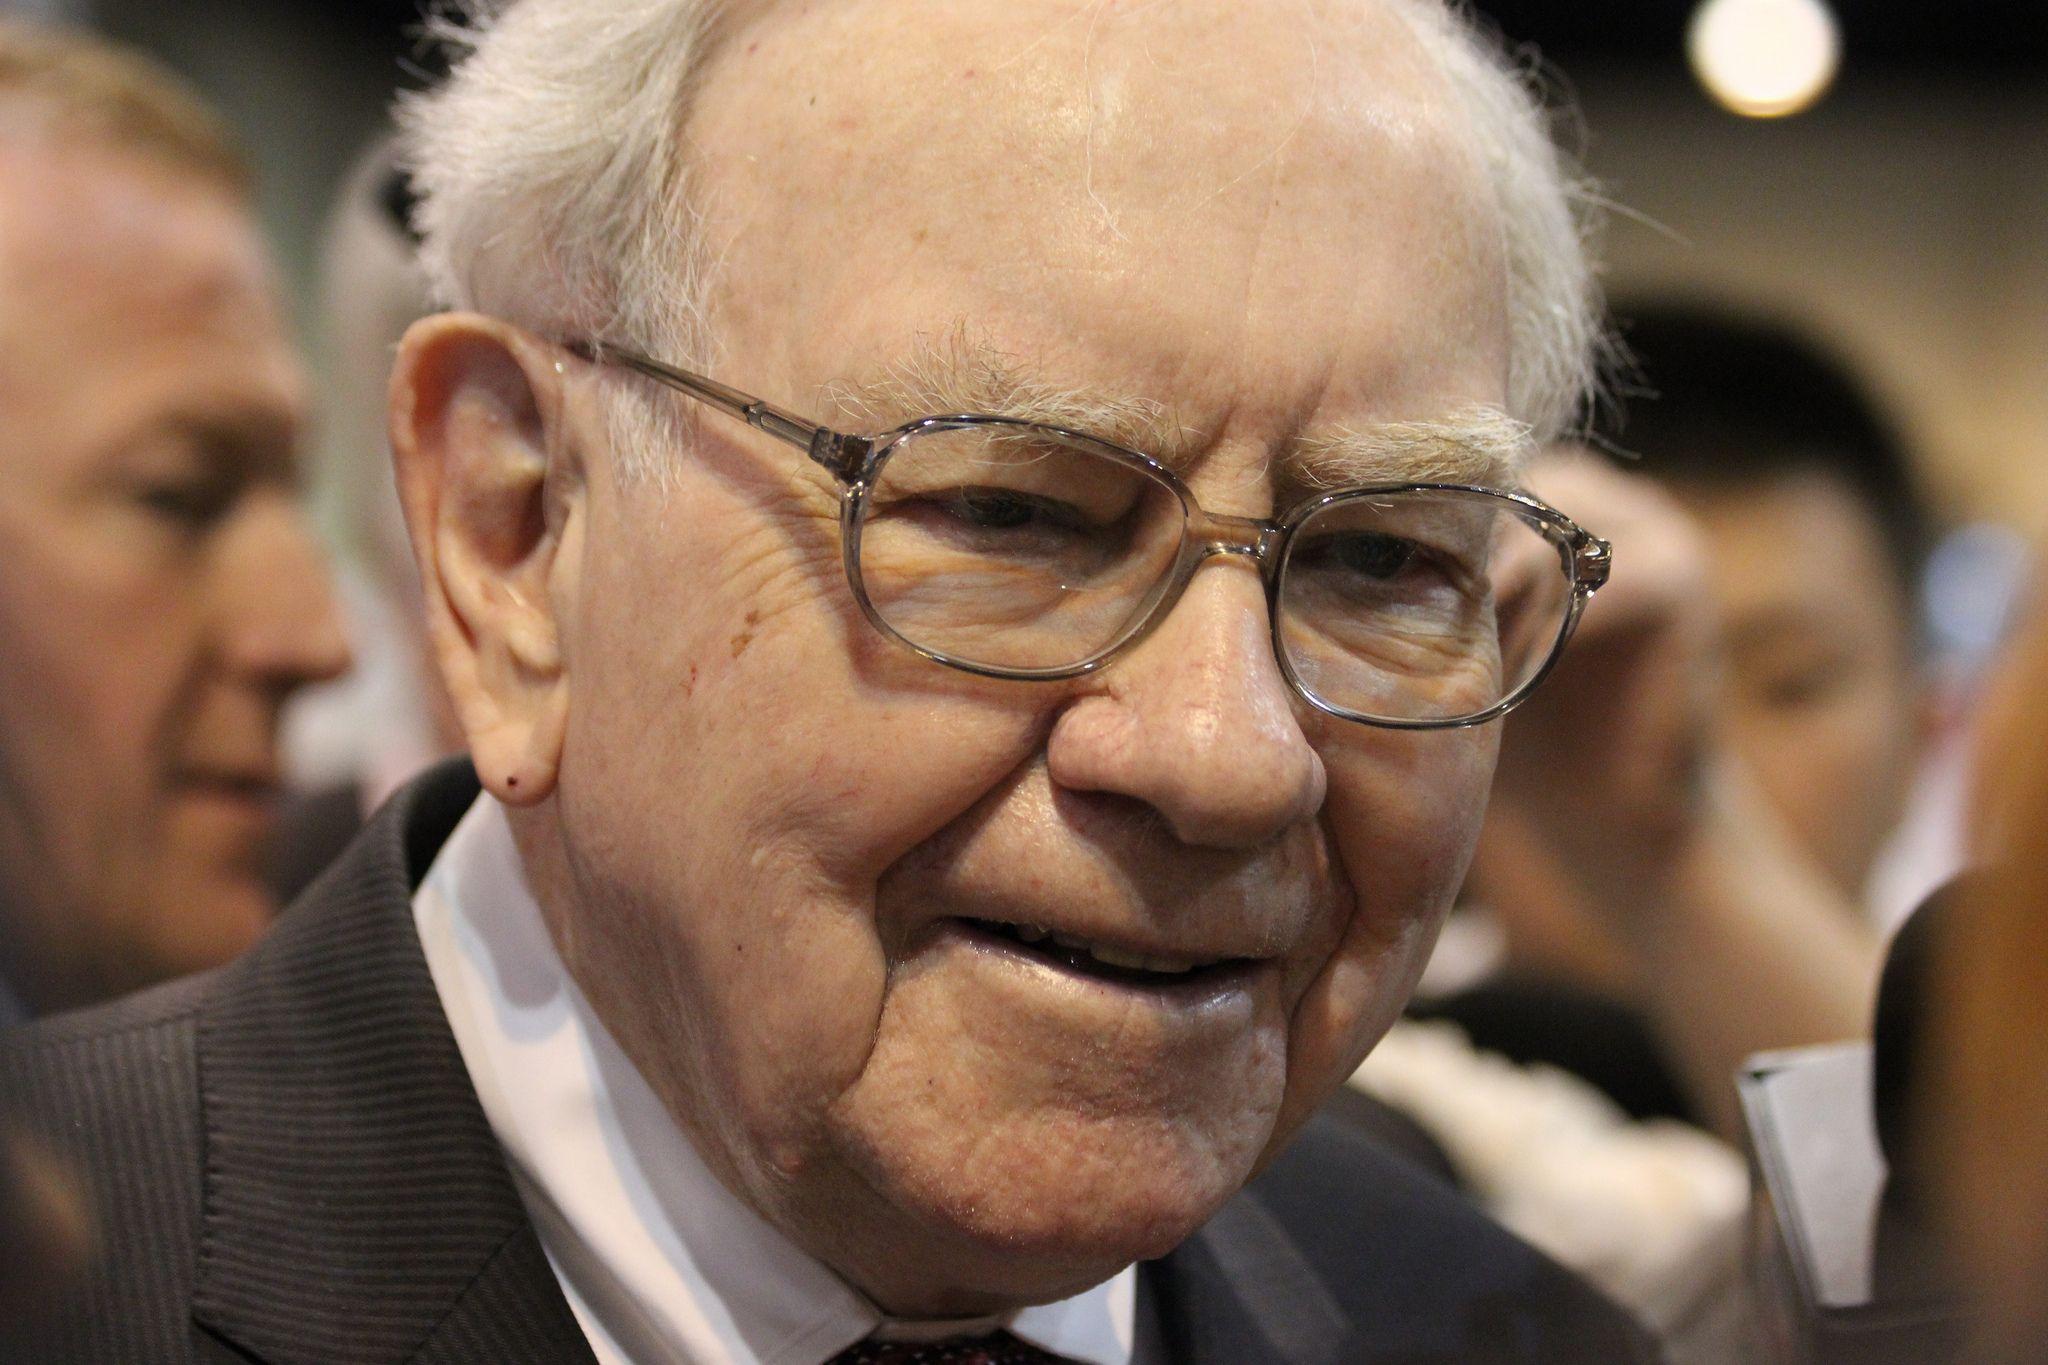 Warren Buffett Is Betting $86 Billion on This Industry | The Motley Fool